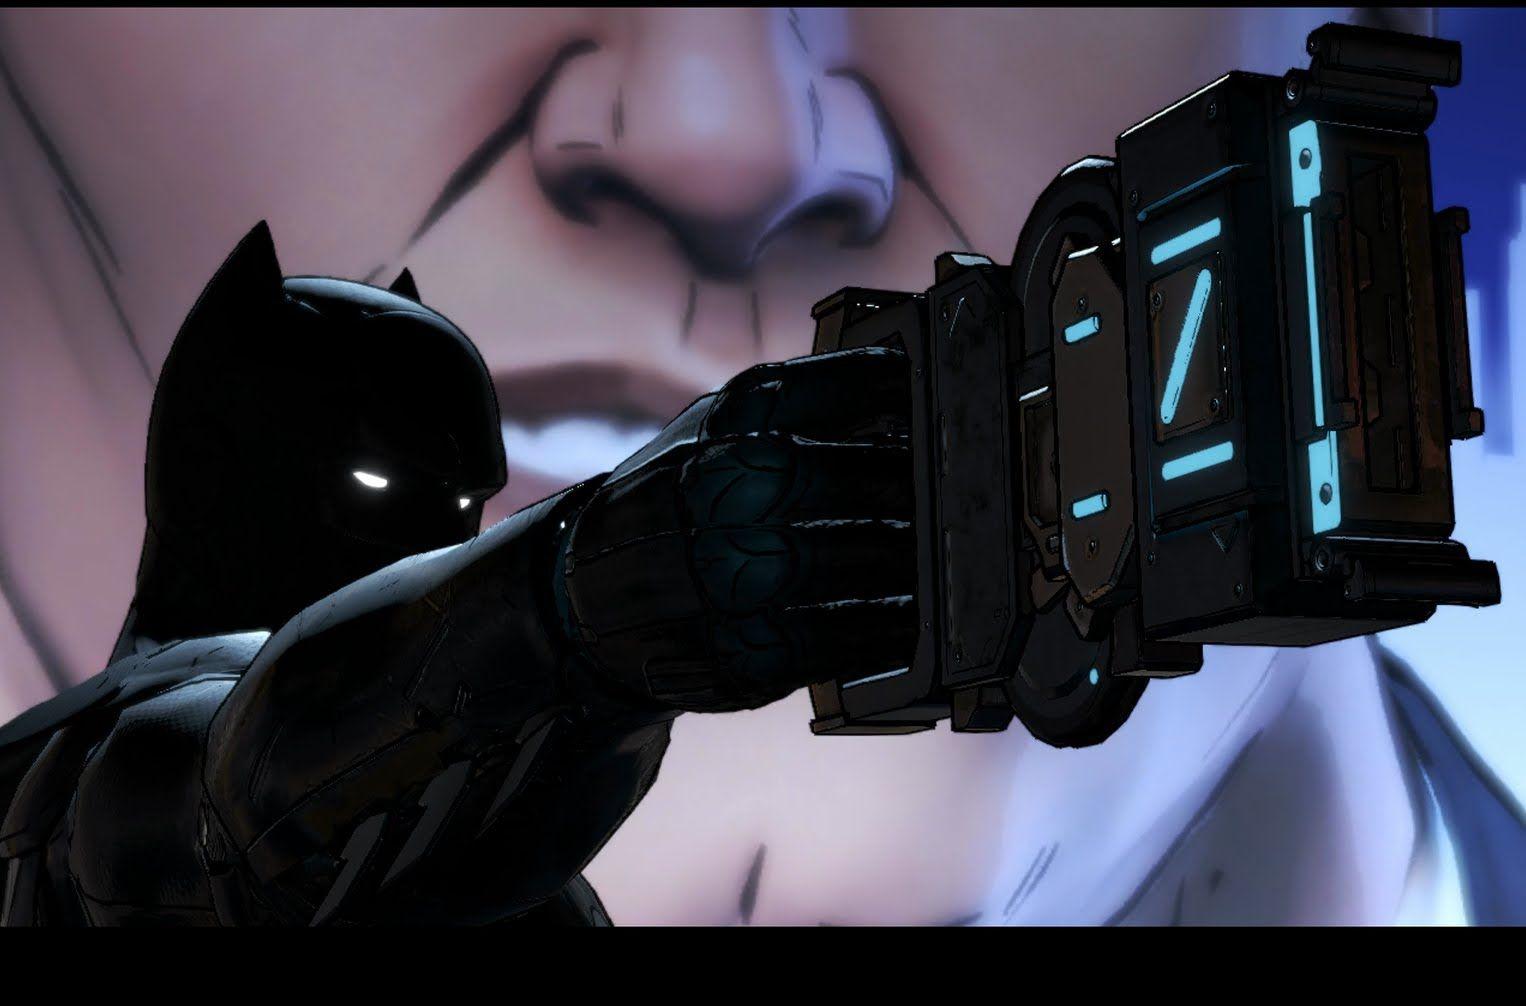 Batman: Realm of Shadows -The Animated Telltale Movie (No